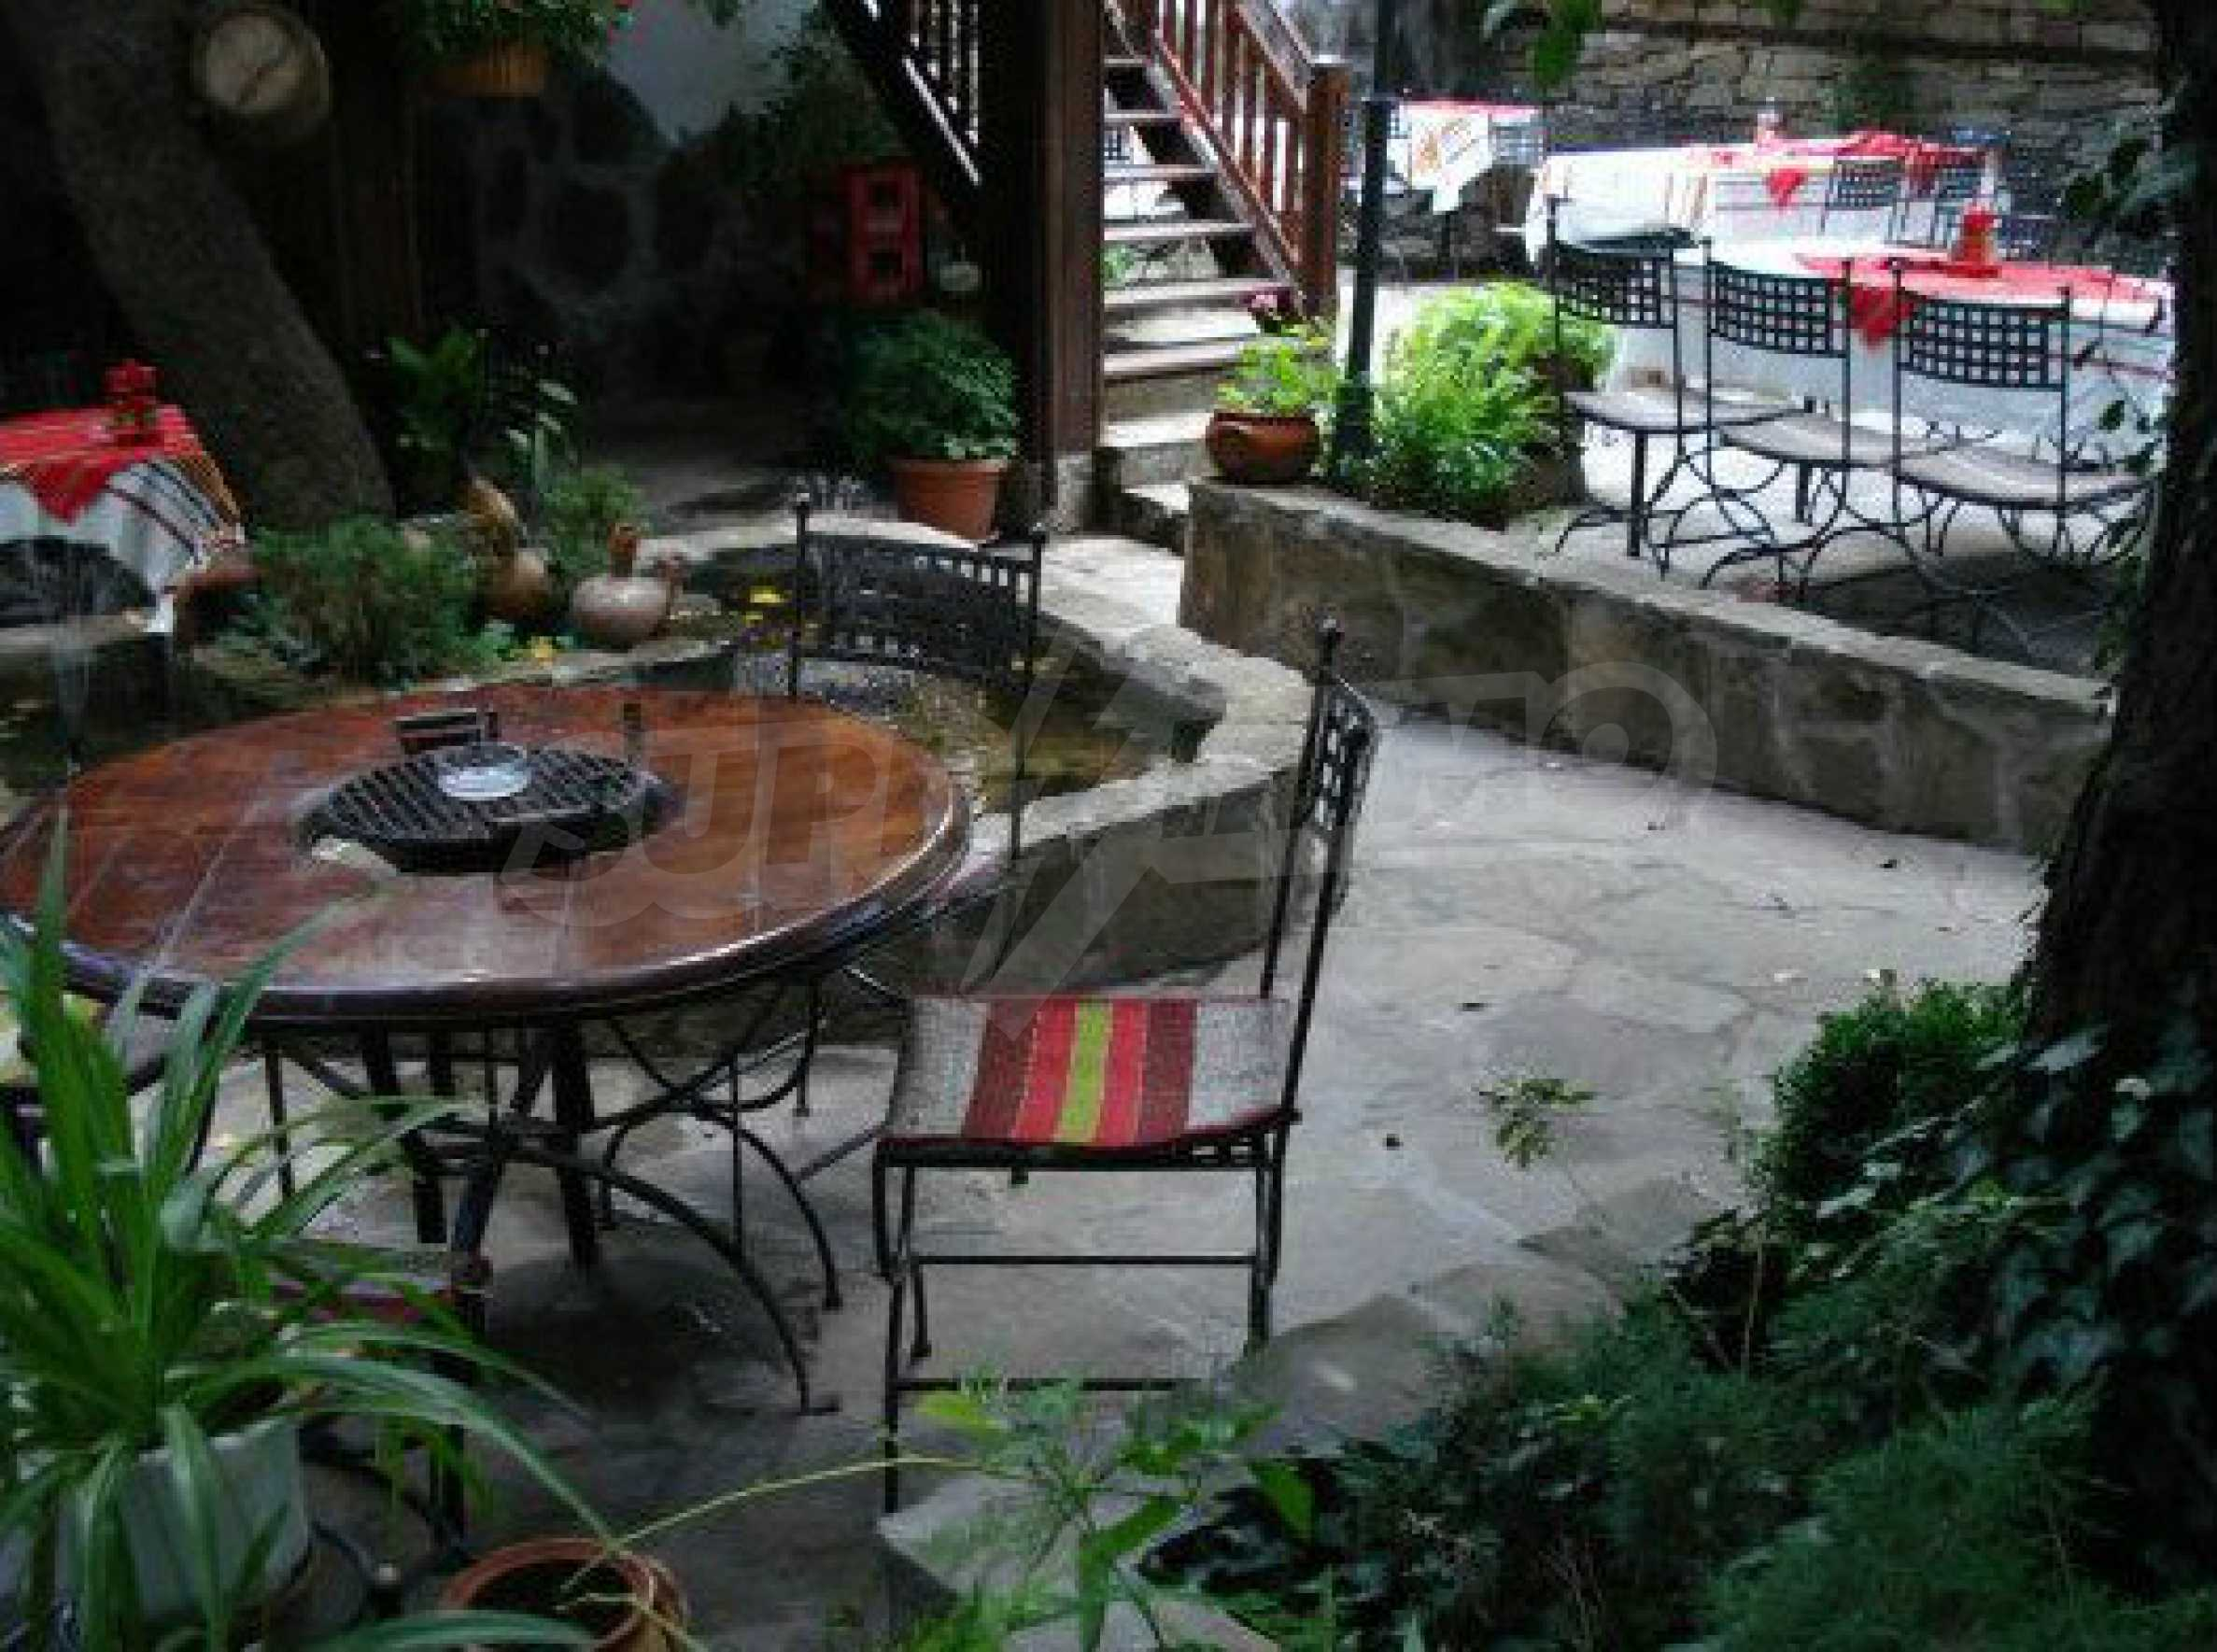 Hotelanlage mit Restaurant am Ufer des Flusses Osam in Lovech 66